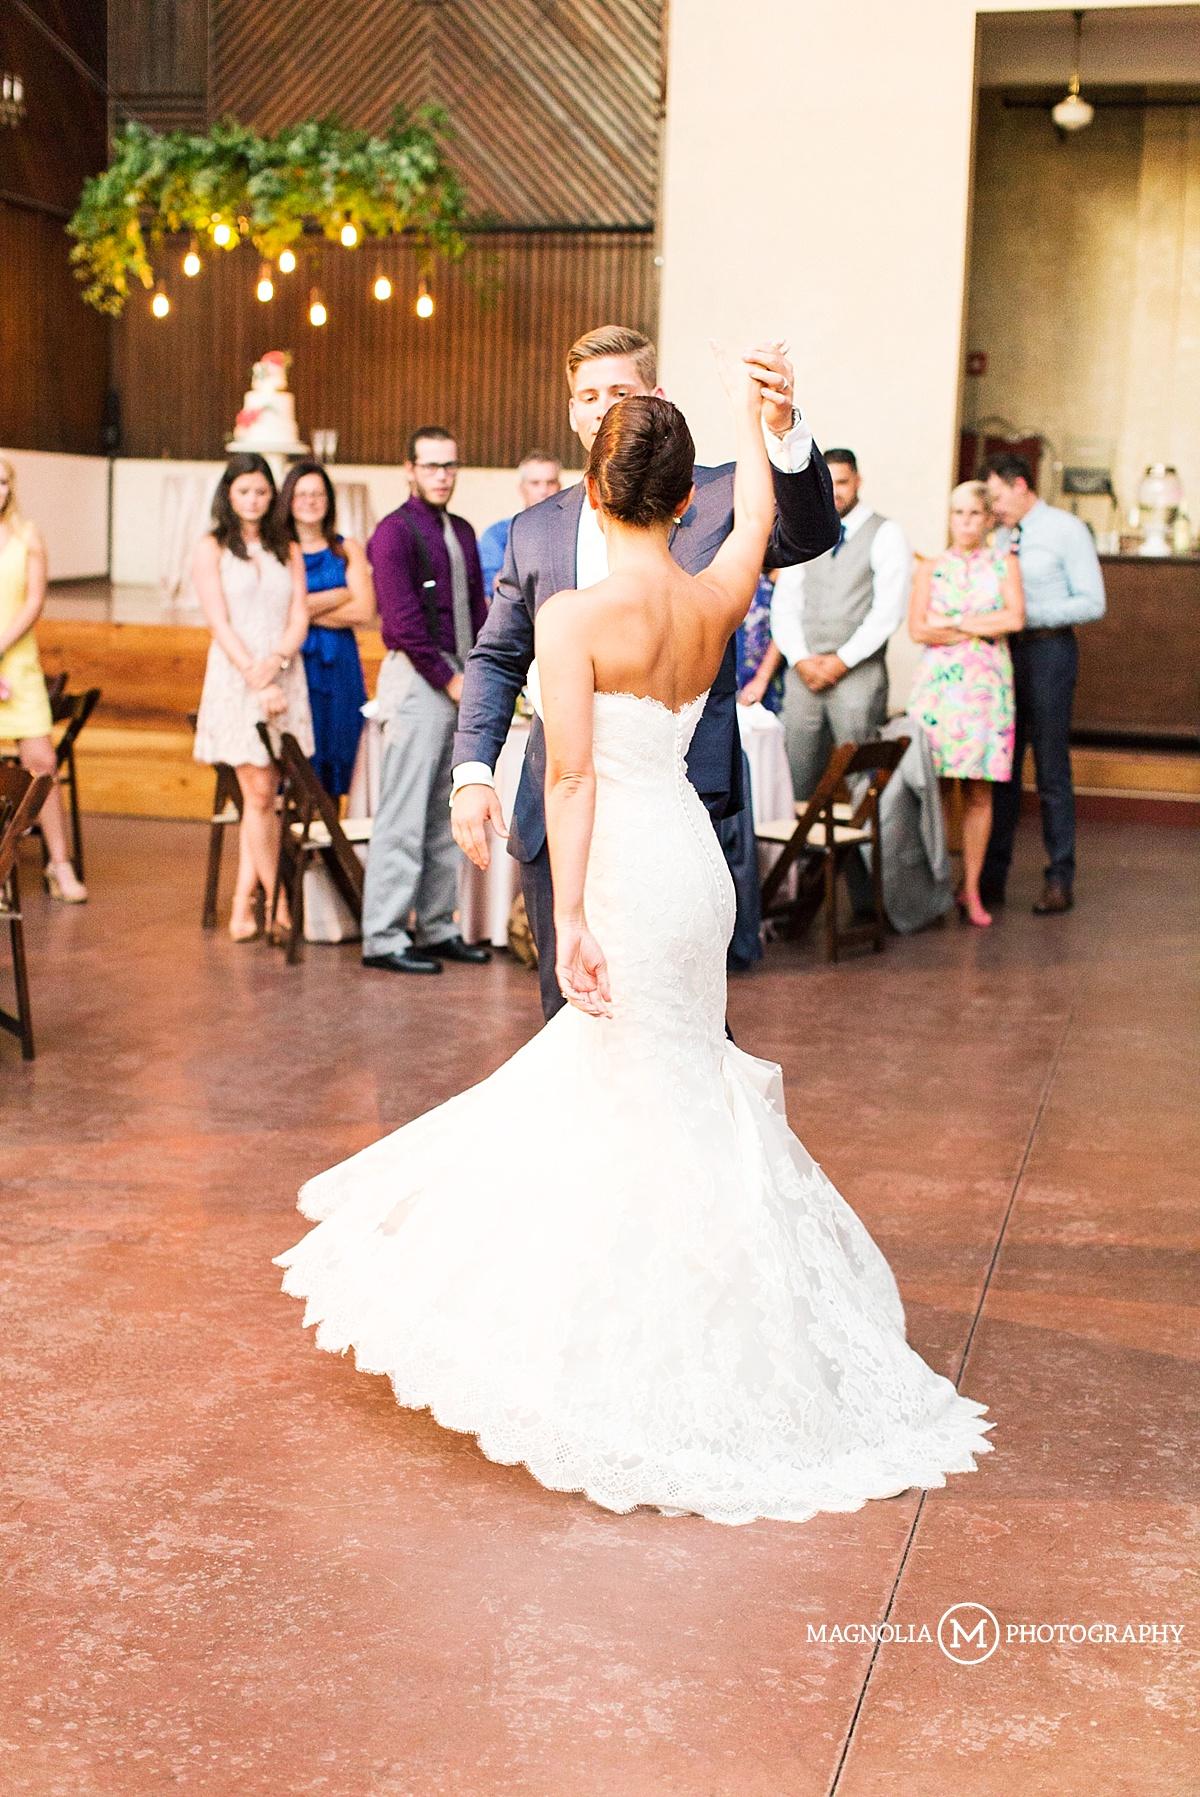 weddings at brooklyn arts center-73-1